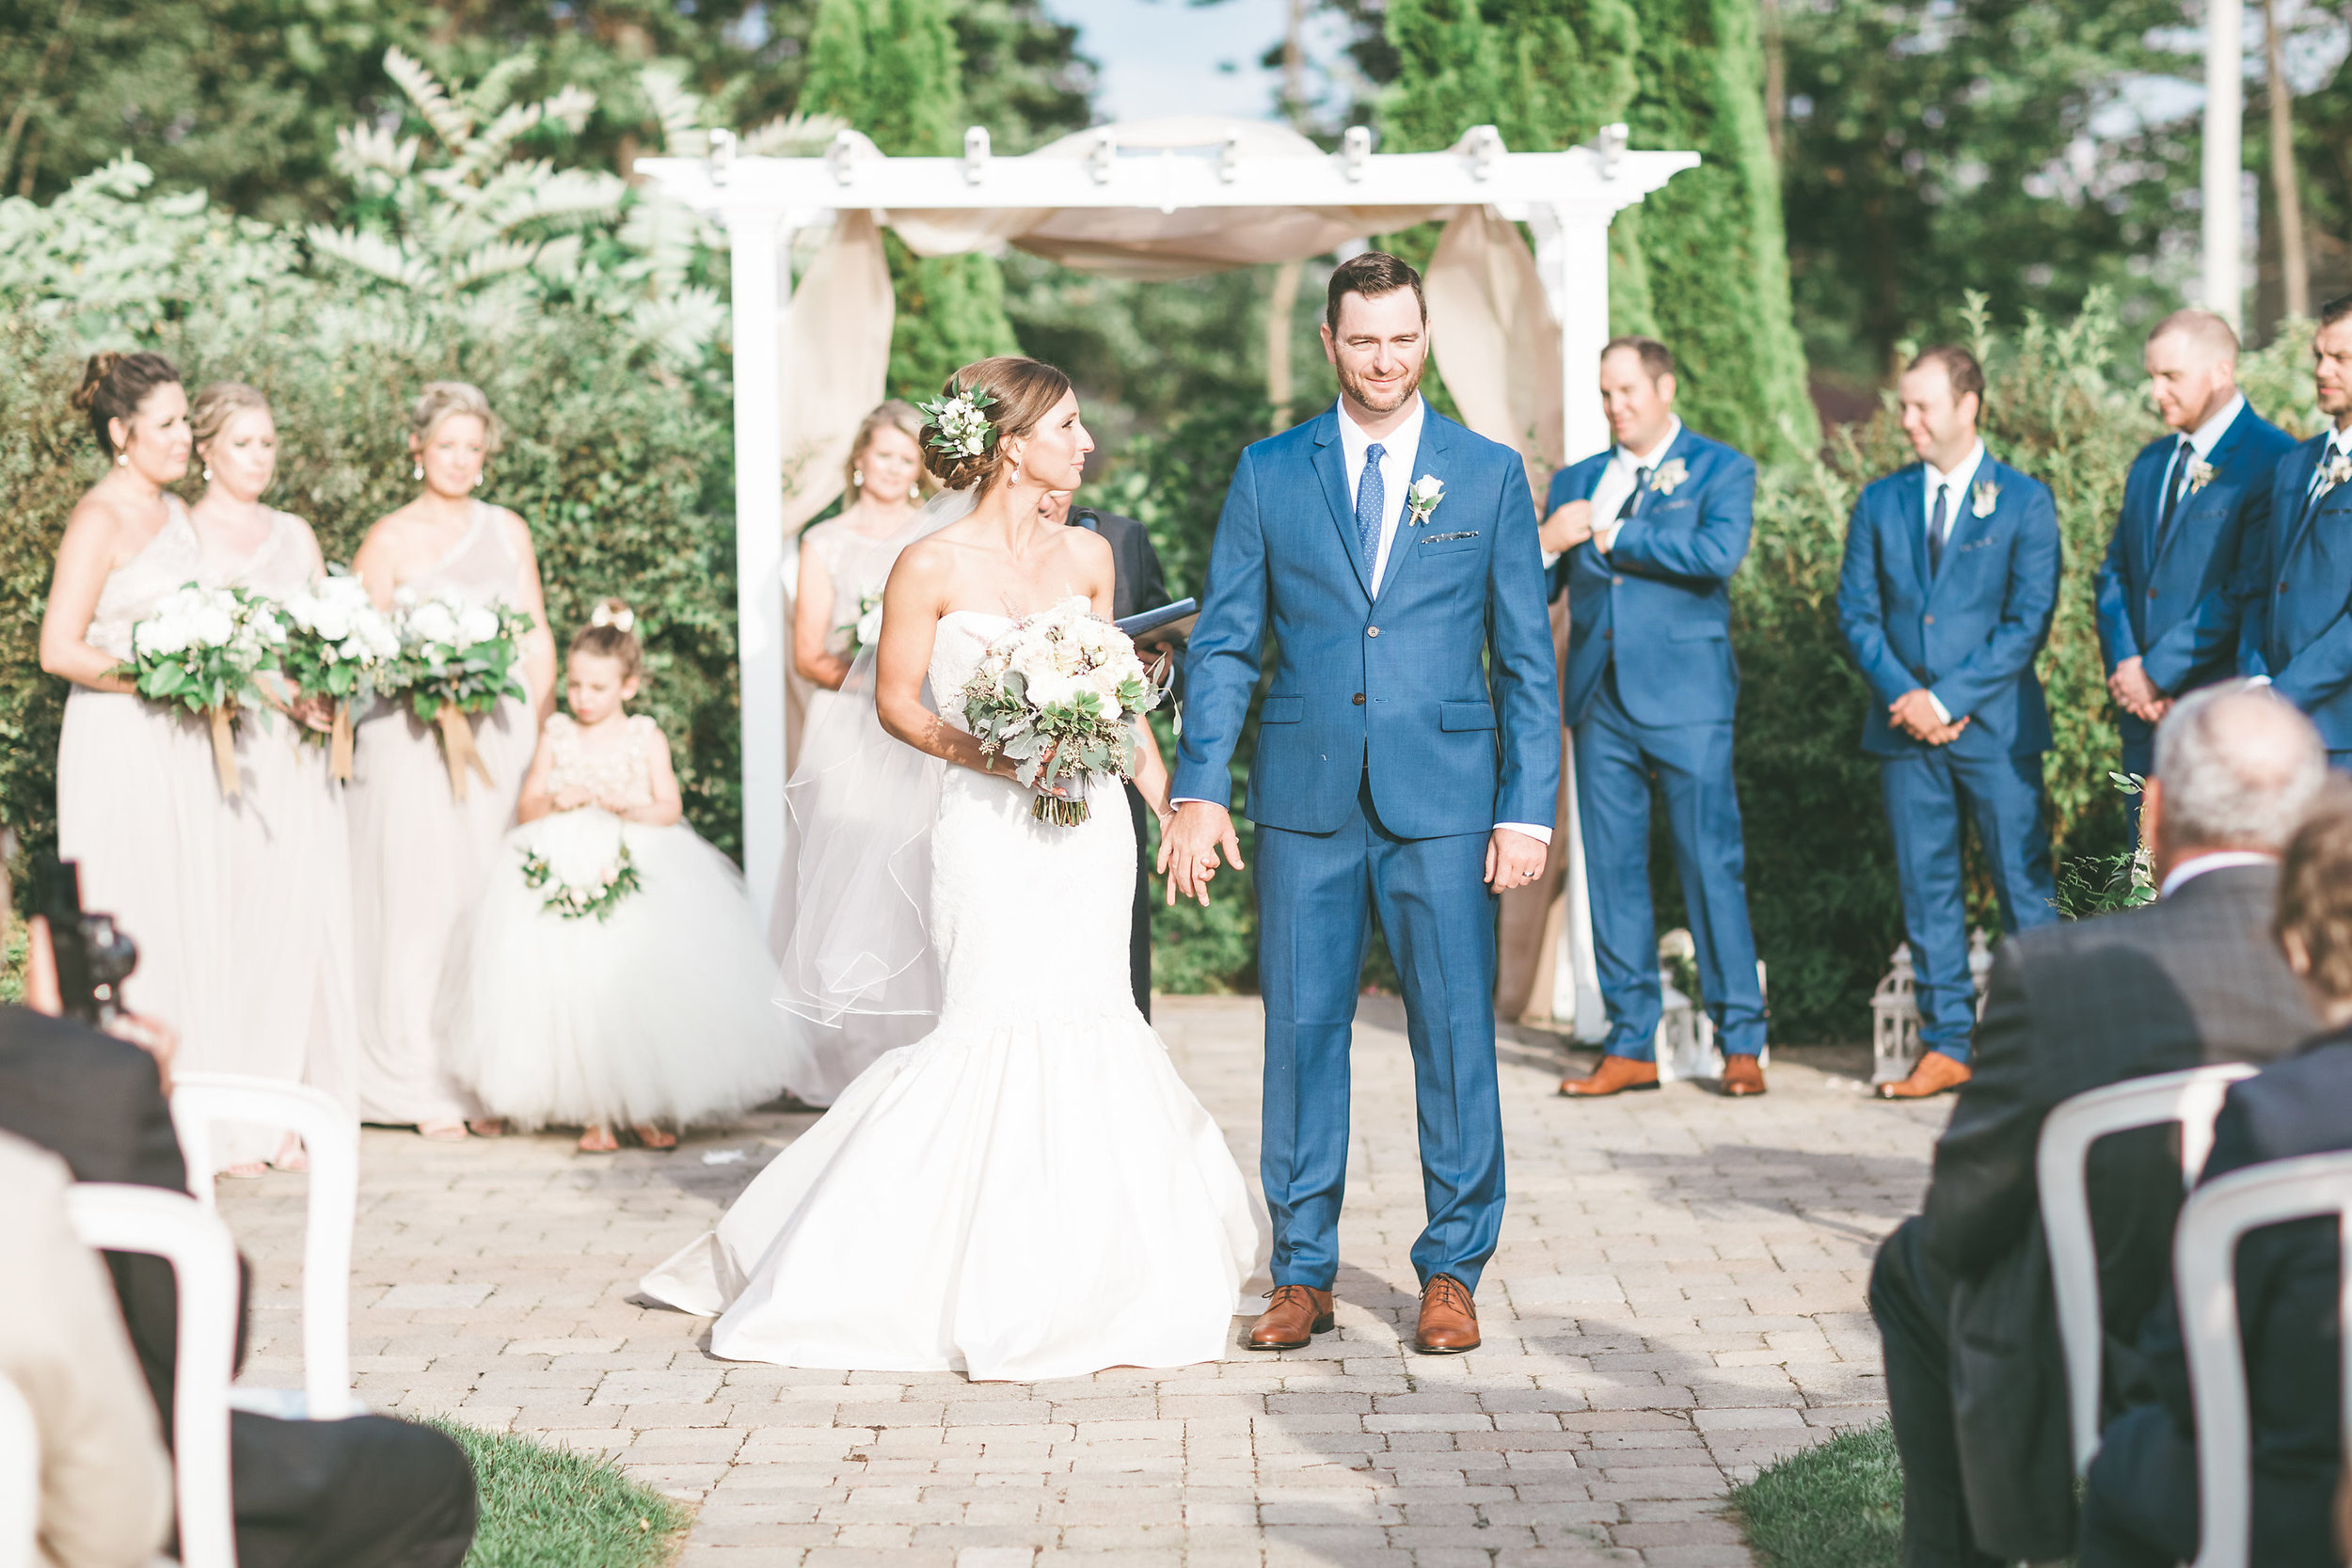 meaghan___darryl_wedding___danielcarusophotography___0862.jpg